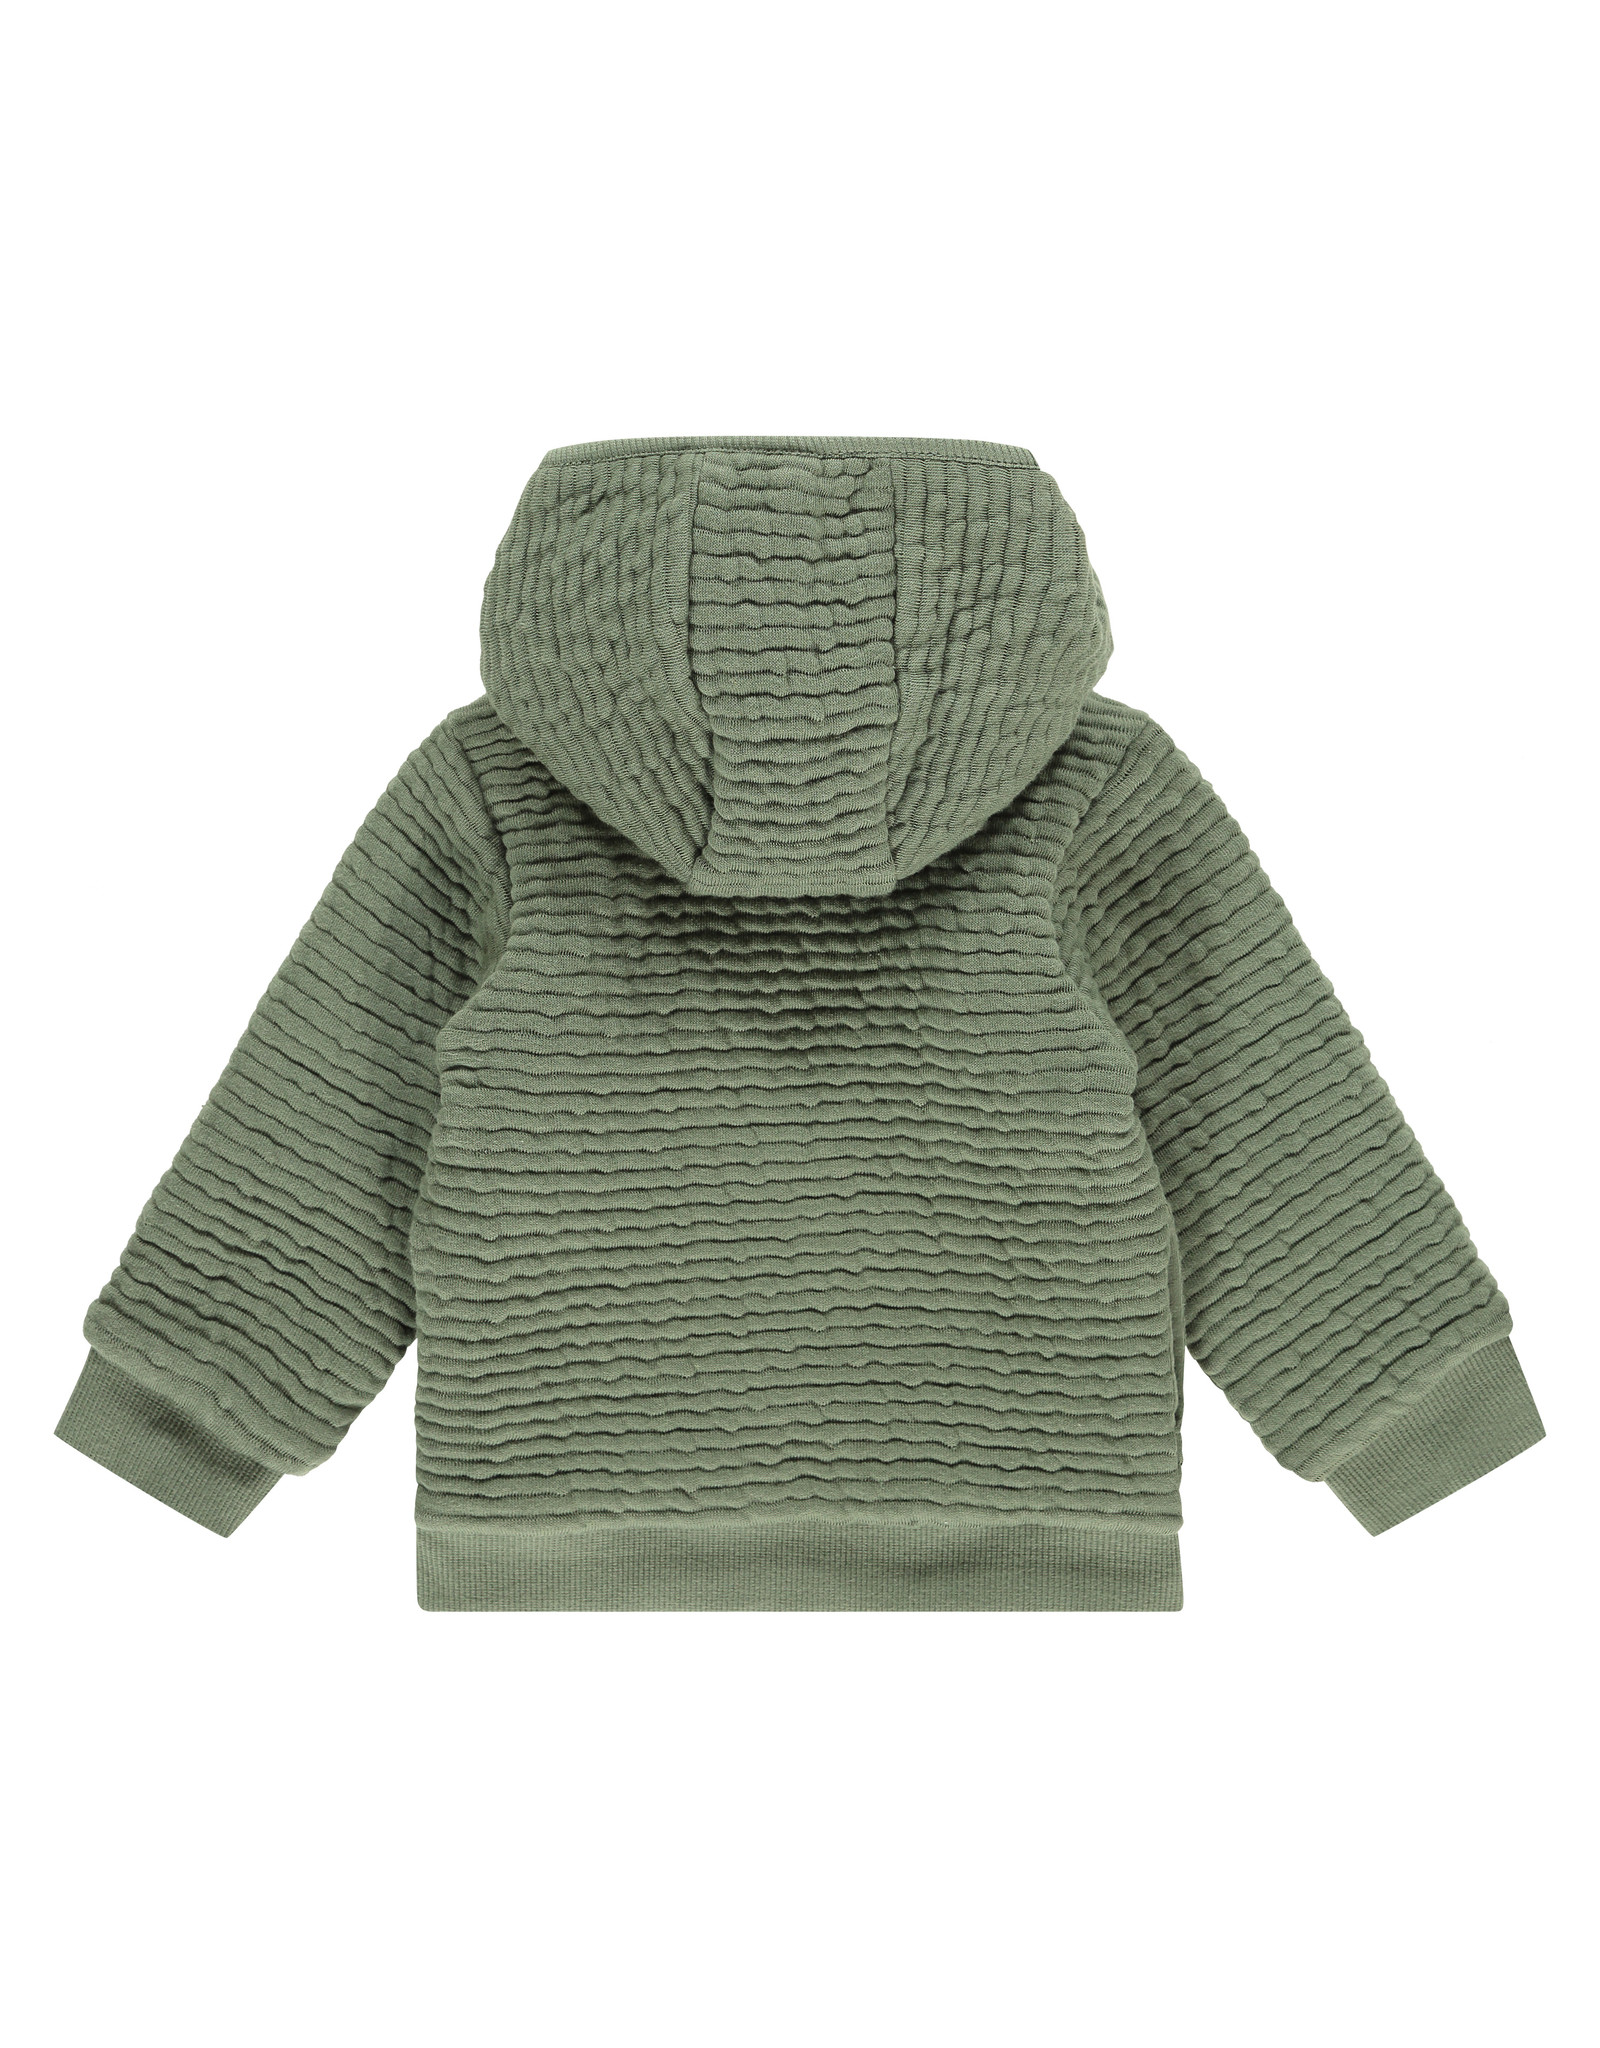 Babyface baby boys jacket, army